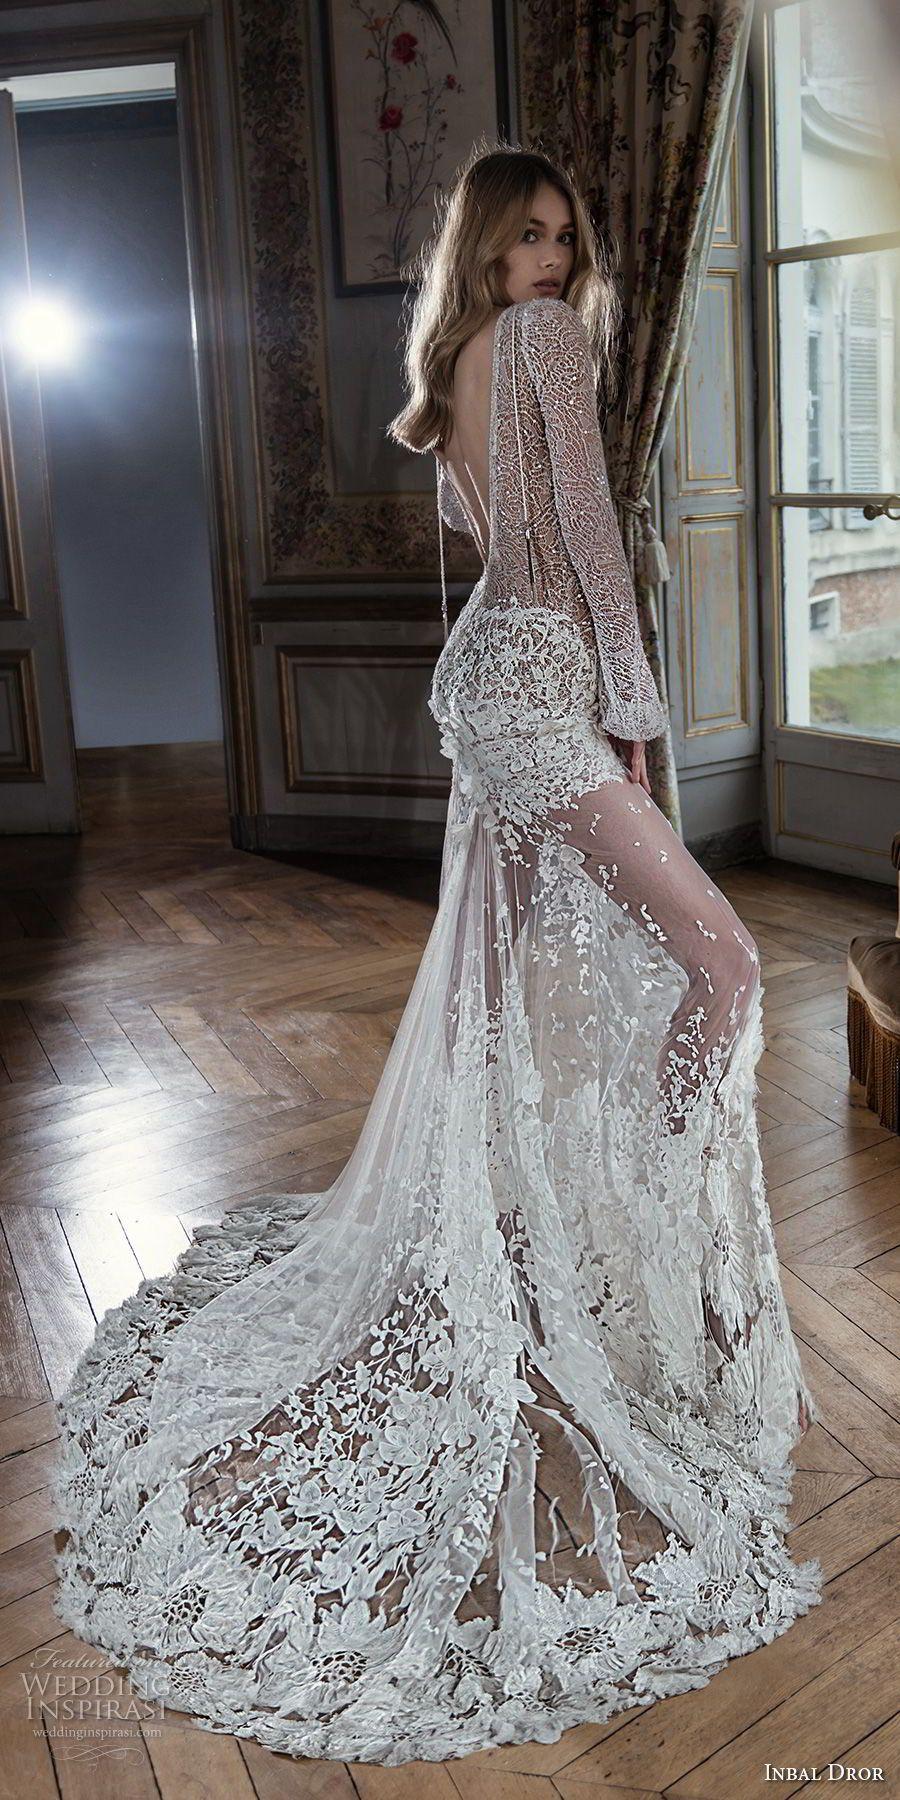 Inbal Dror Fall 2018 Wedding Dresses Lookbook Wedding Inspirasi Perfect Wedding Dress Beautiful Wedding Dresses Vintage Wedding Dress Romantic